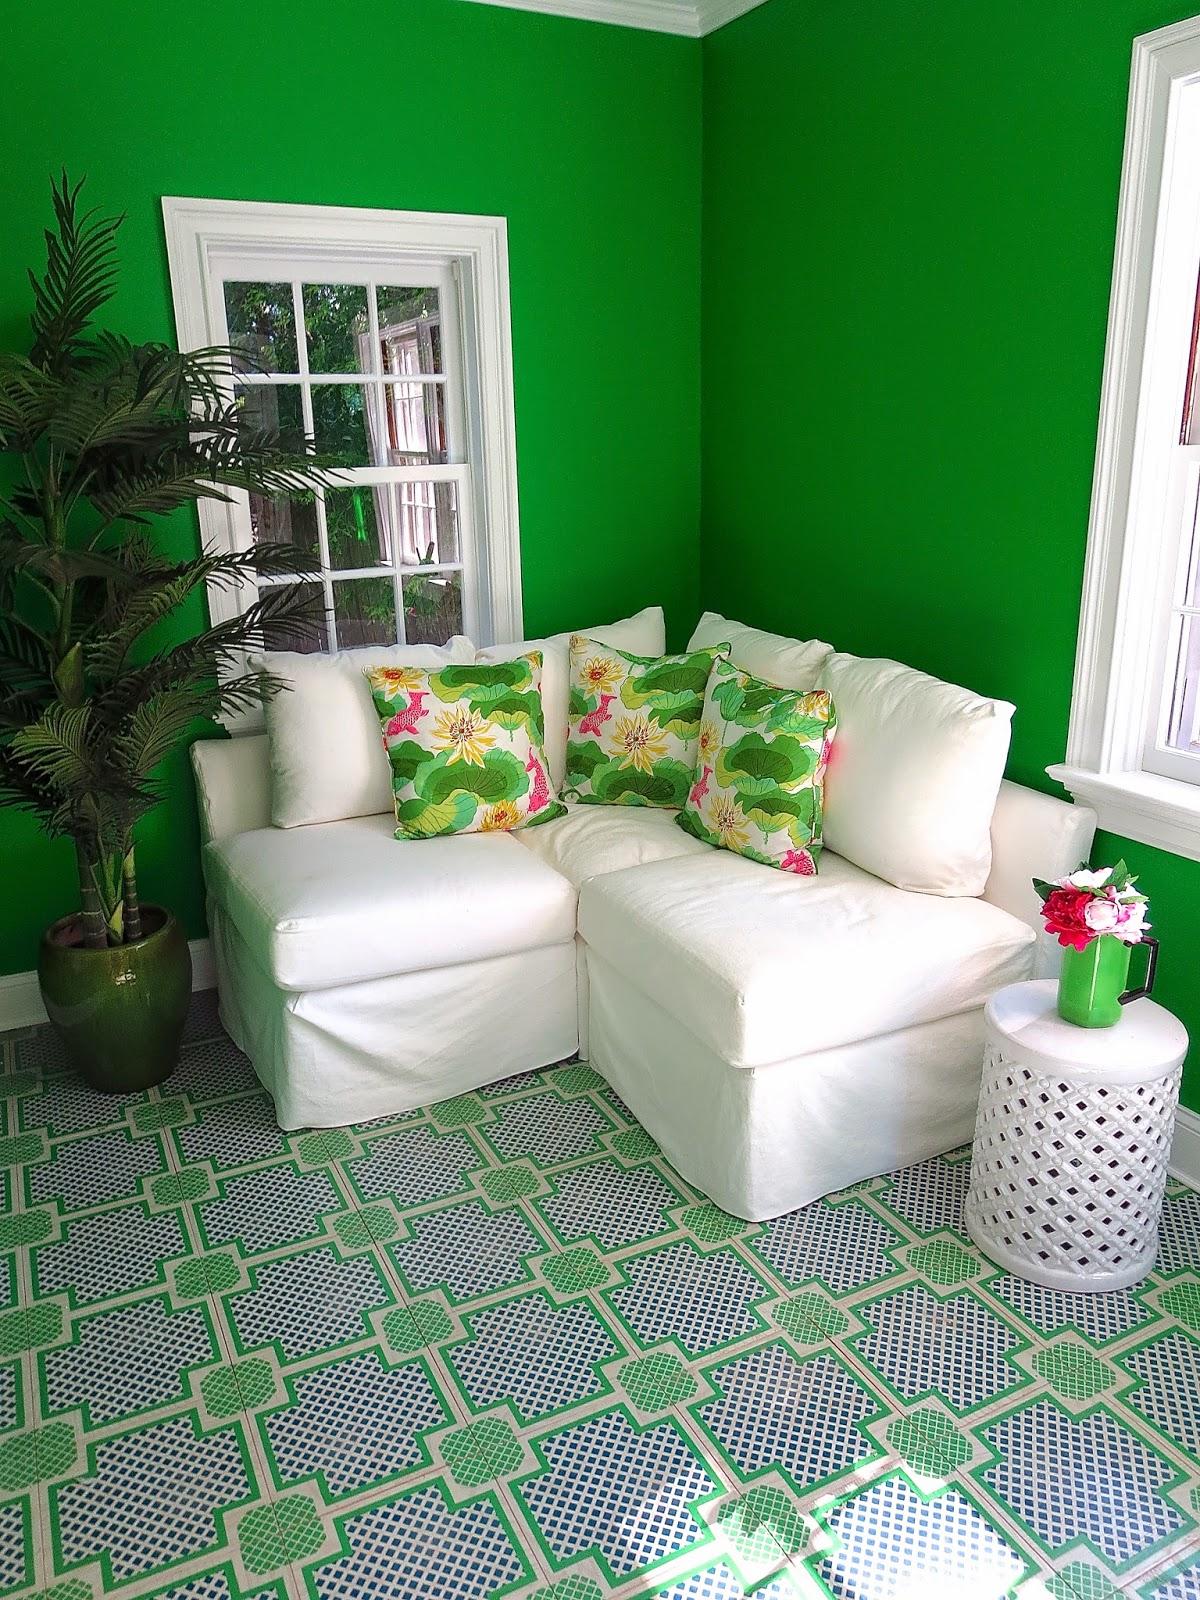 Green Room Garden Design: COCOCOZY: AM'S PRETTY LITTLE GREEN ROOM